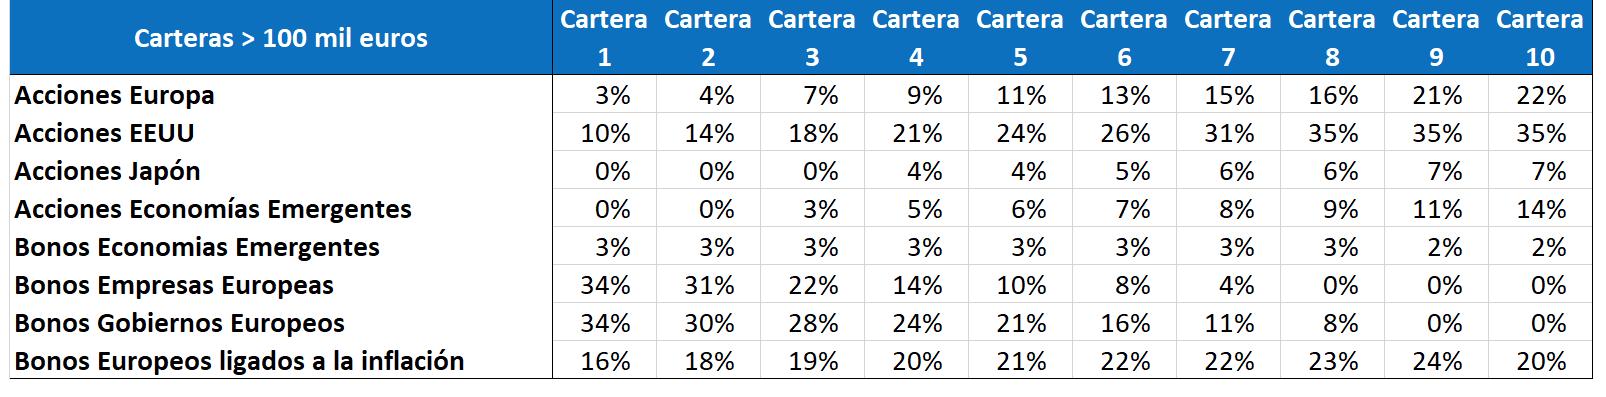 perfiles carteras indexa capital